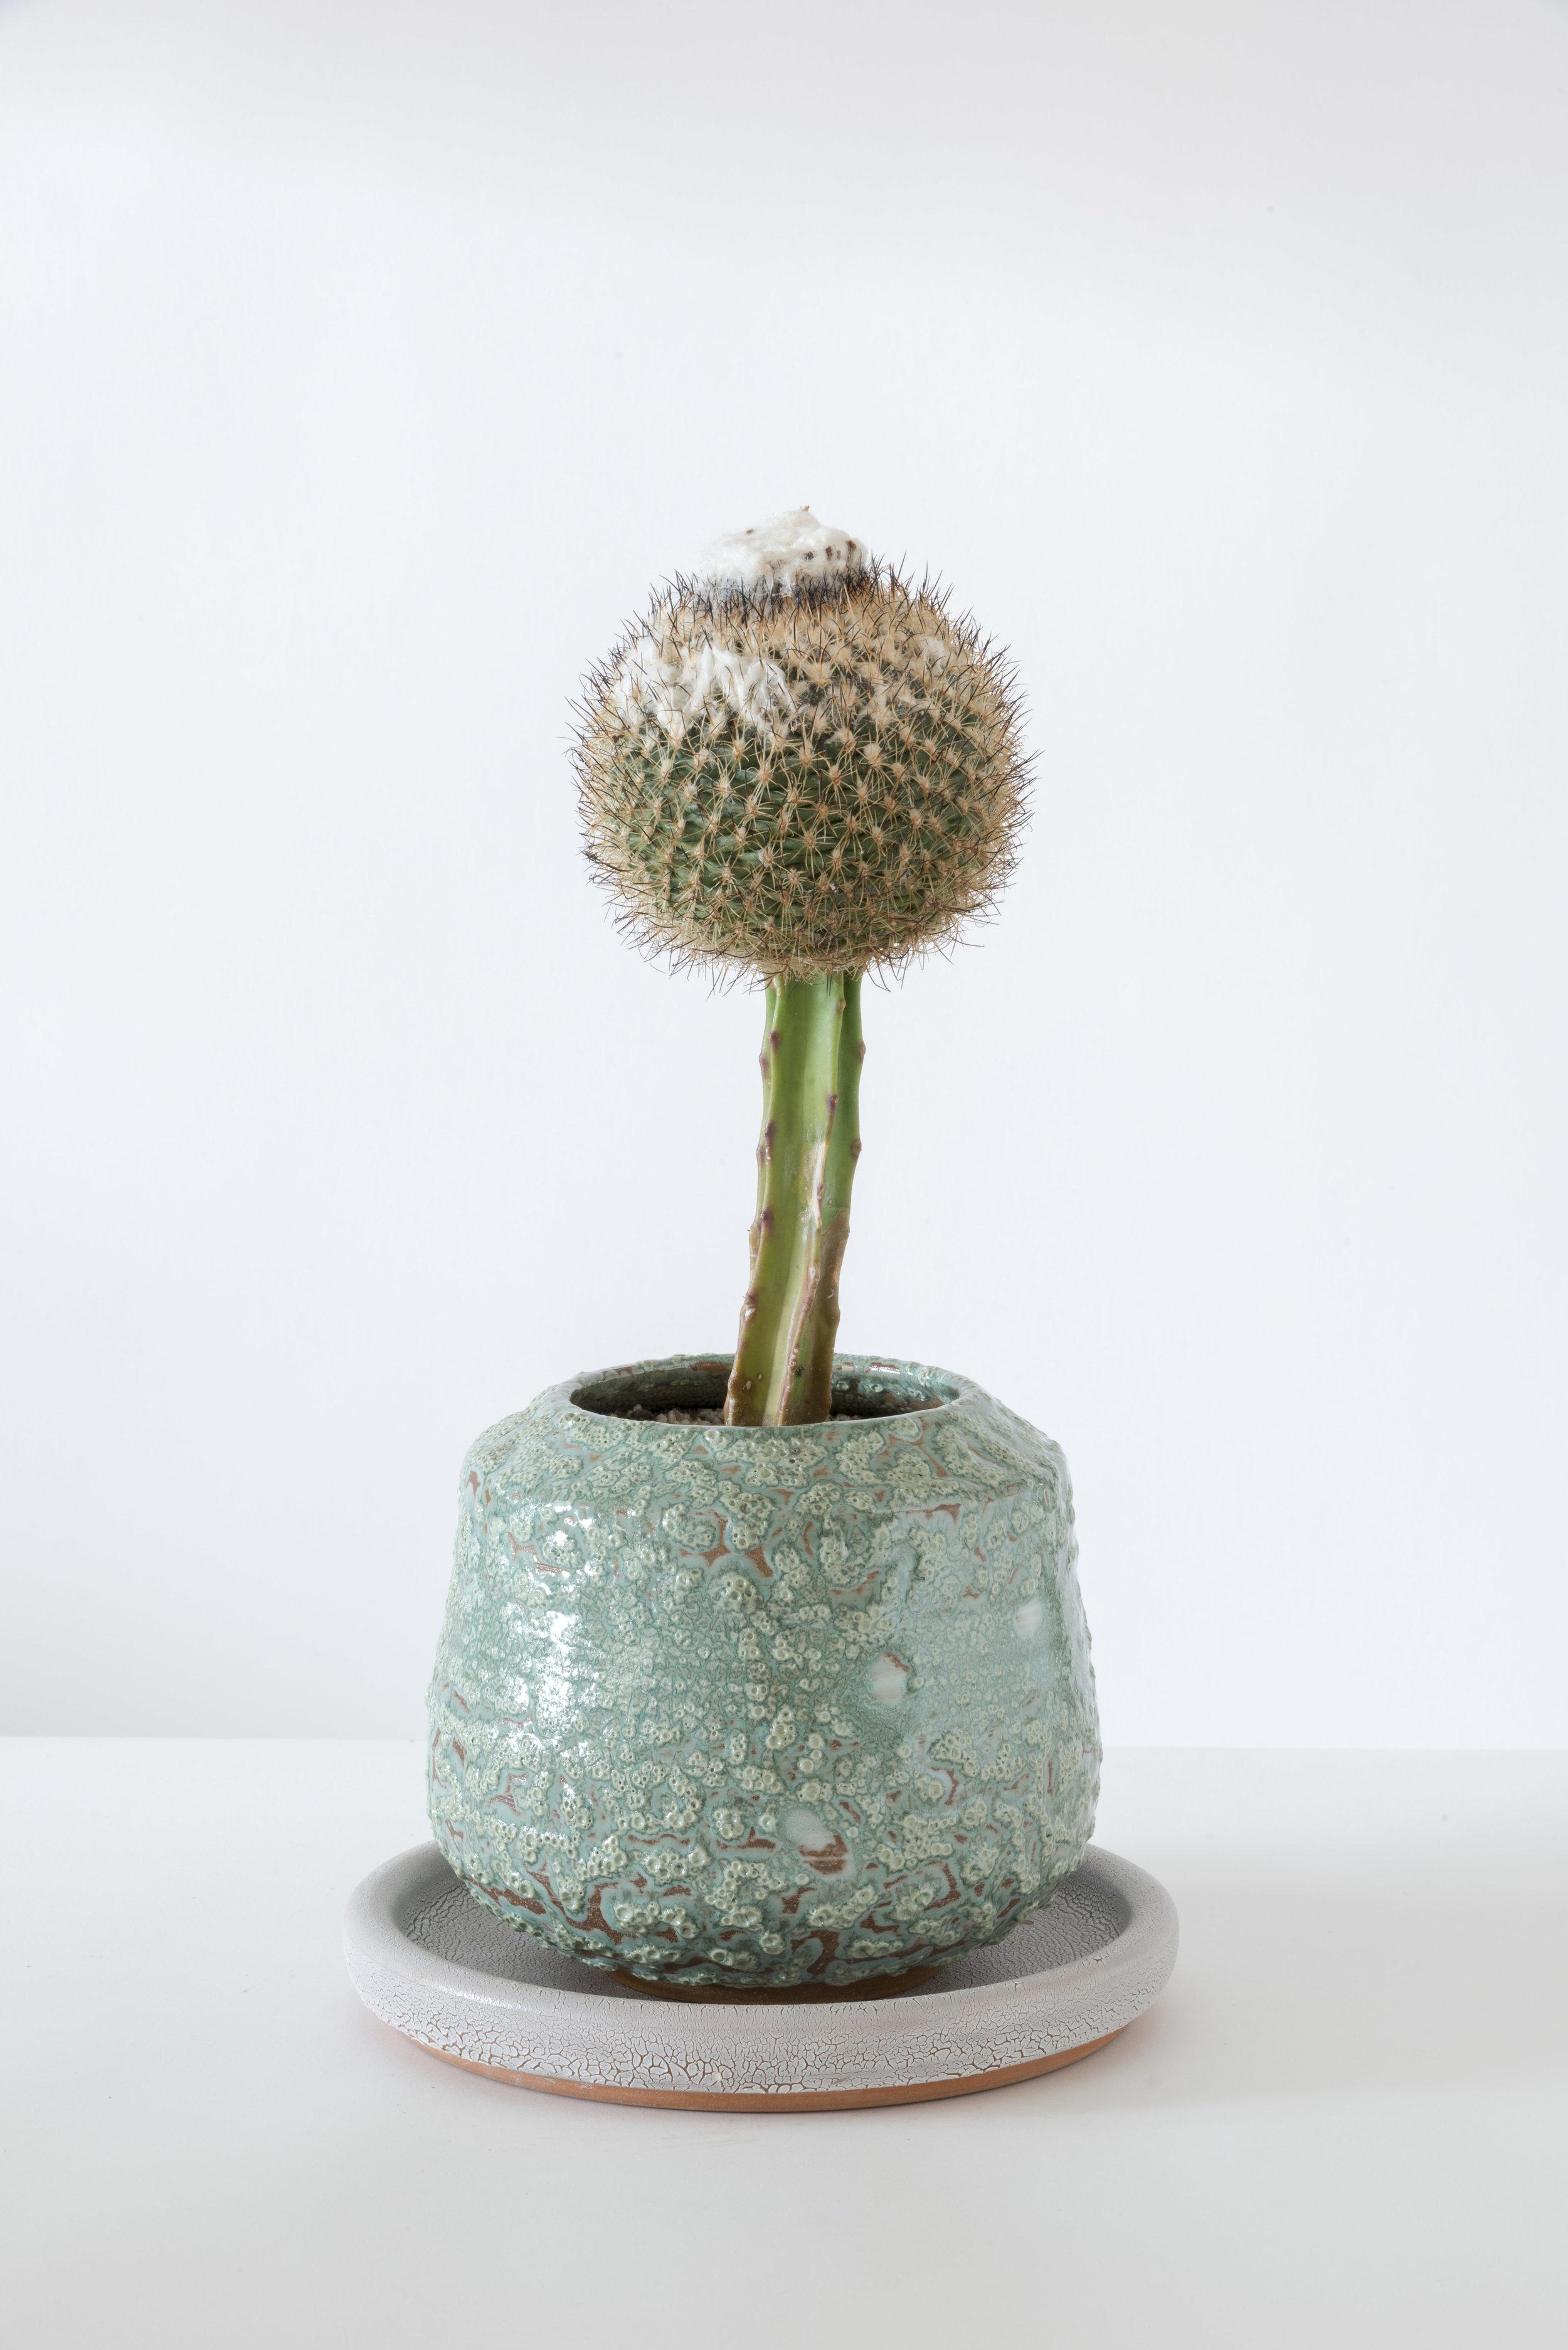 Photo: Joshua White A Tale of Plant & Pot LA